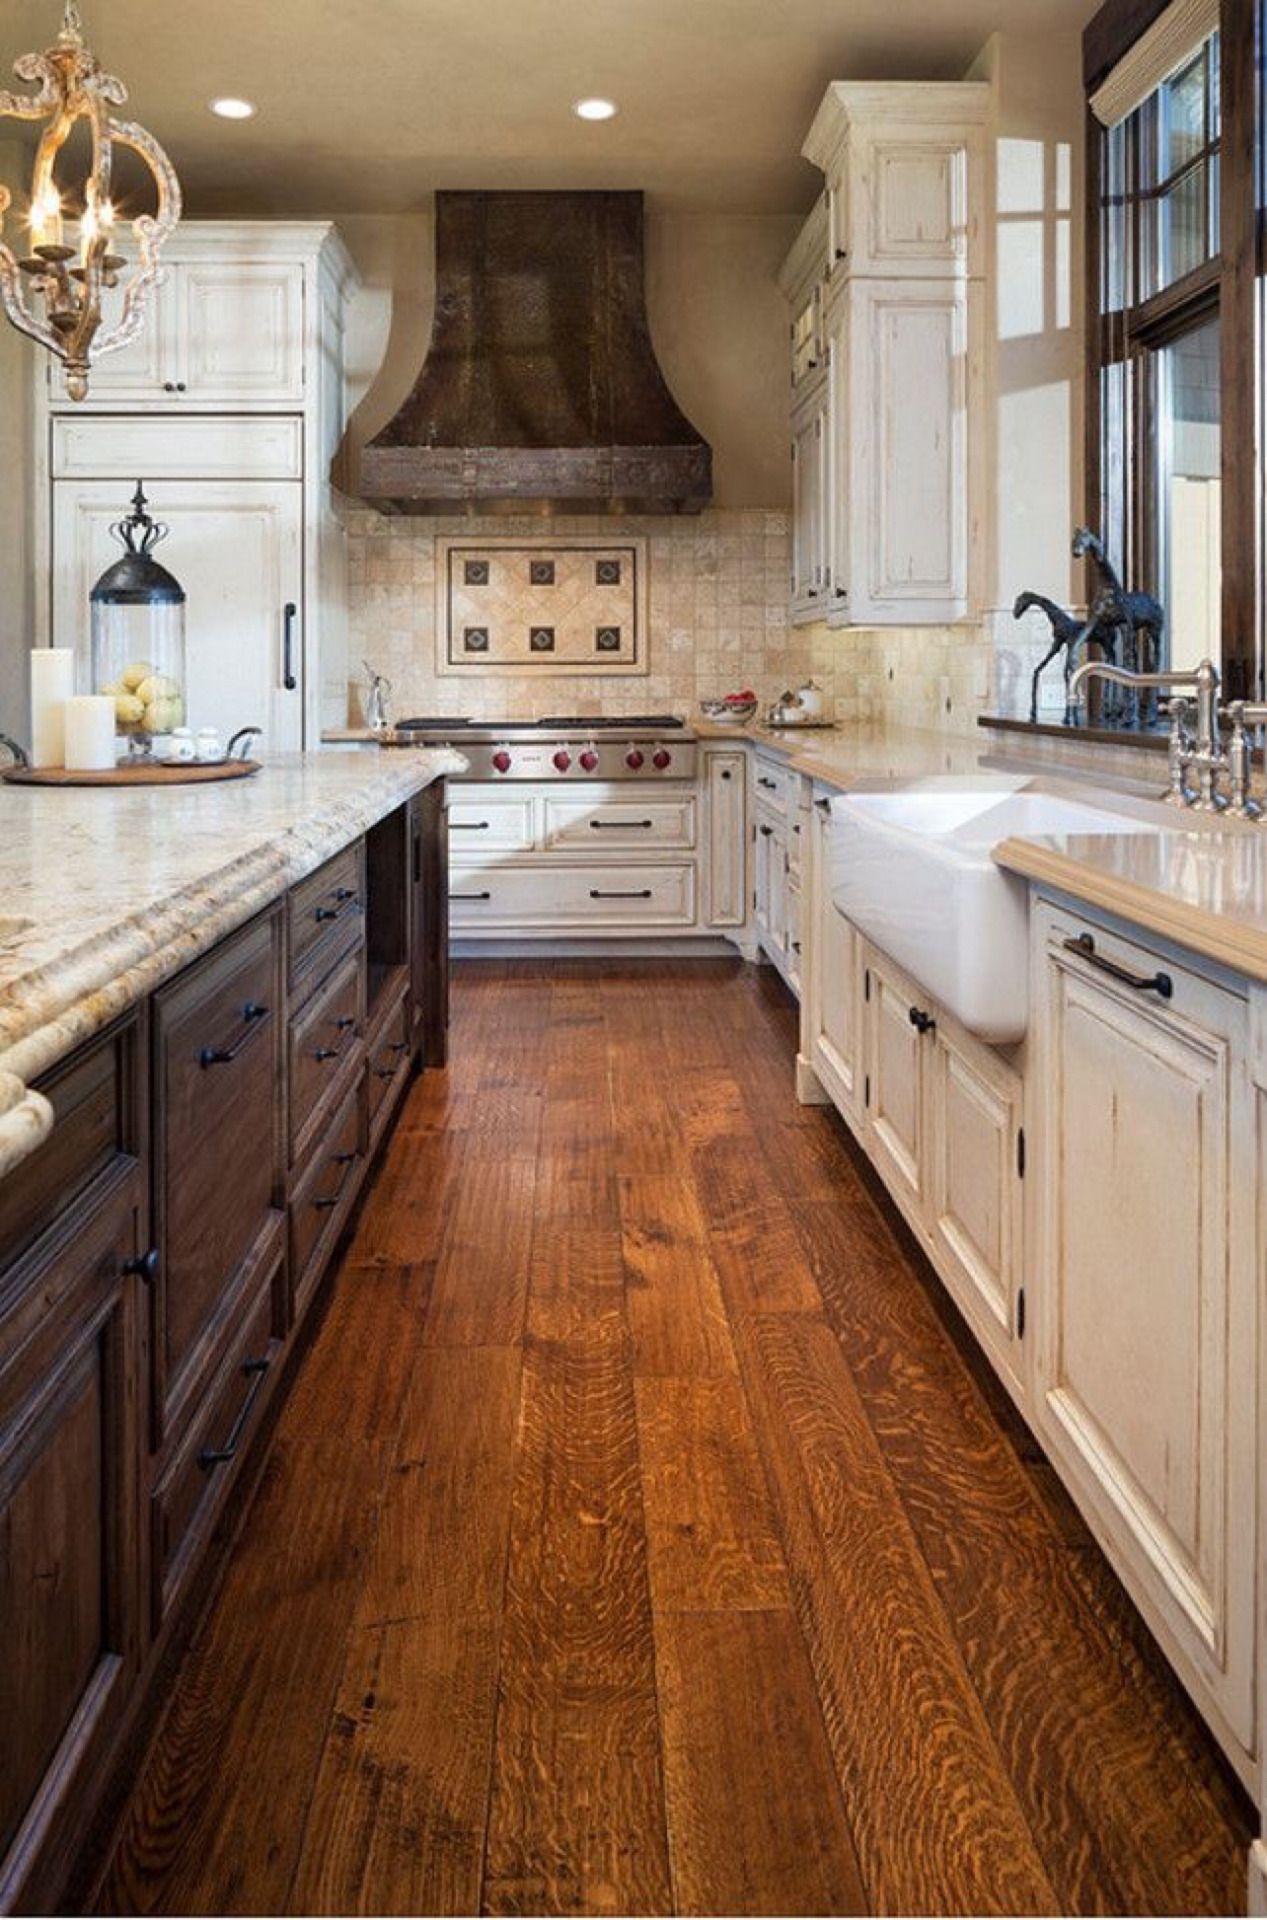 Cozy kitchen kitchen pinterest beautiful life ariel and cozy